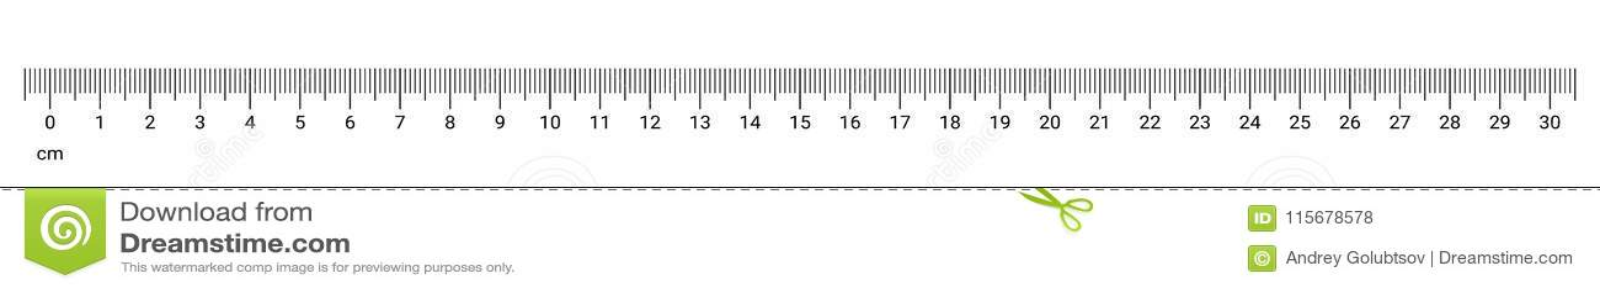 Ruler cm measurement numbers vector scale